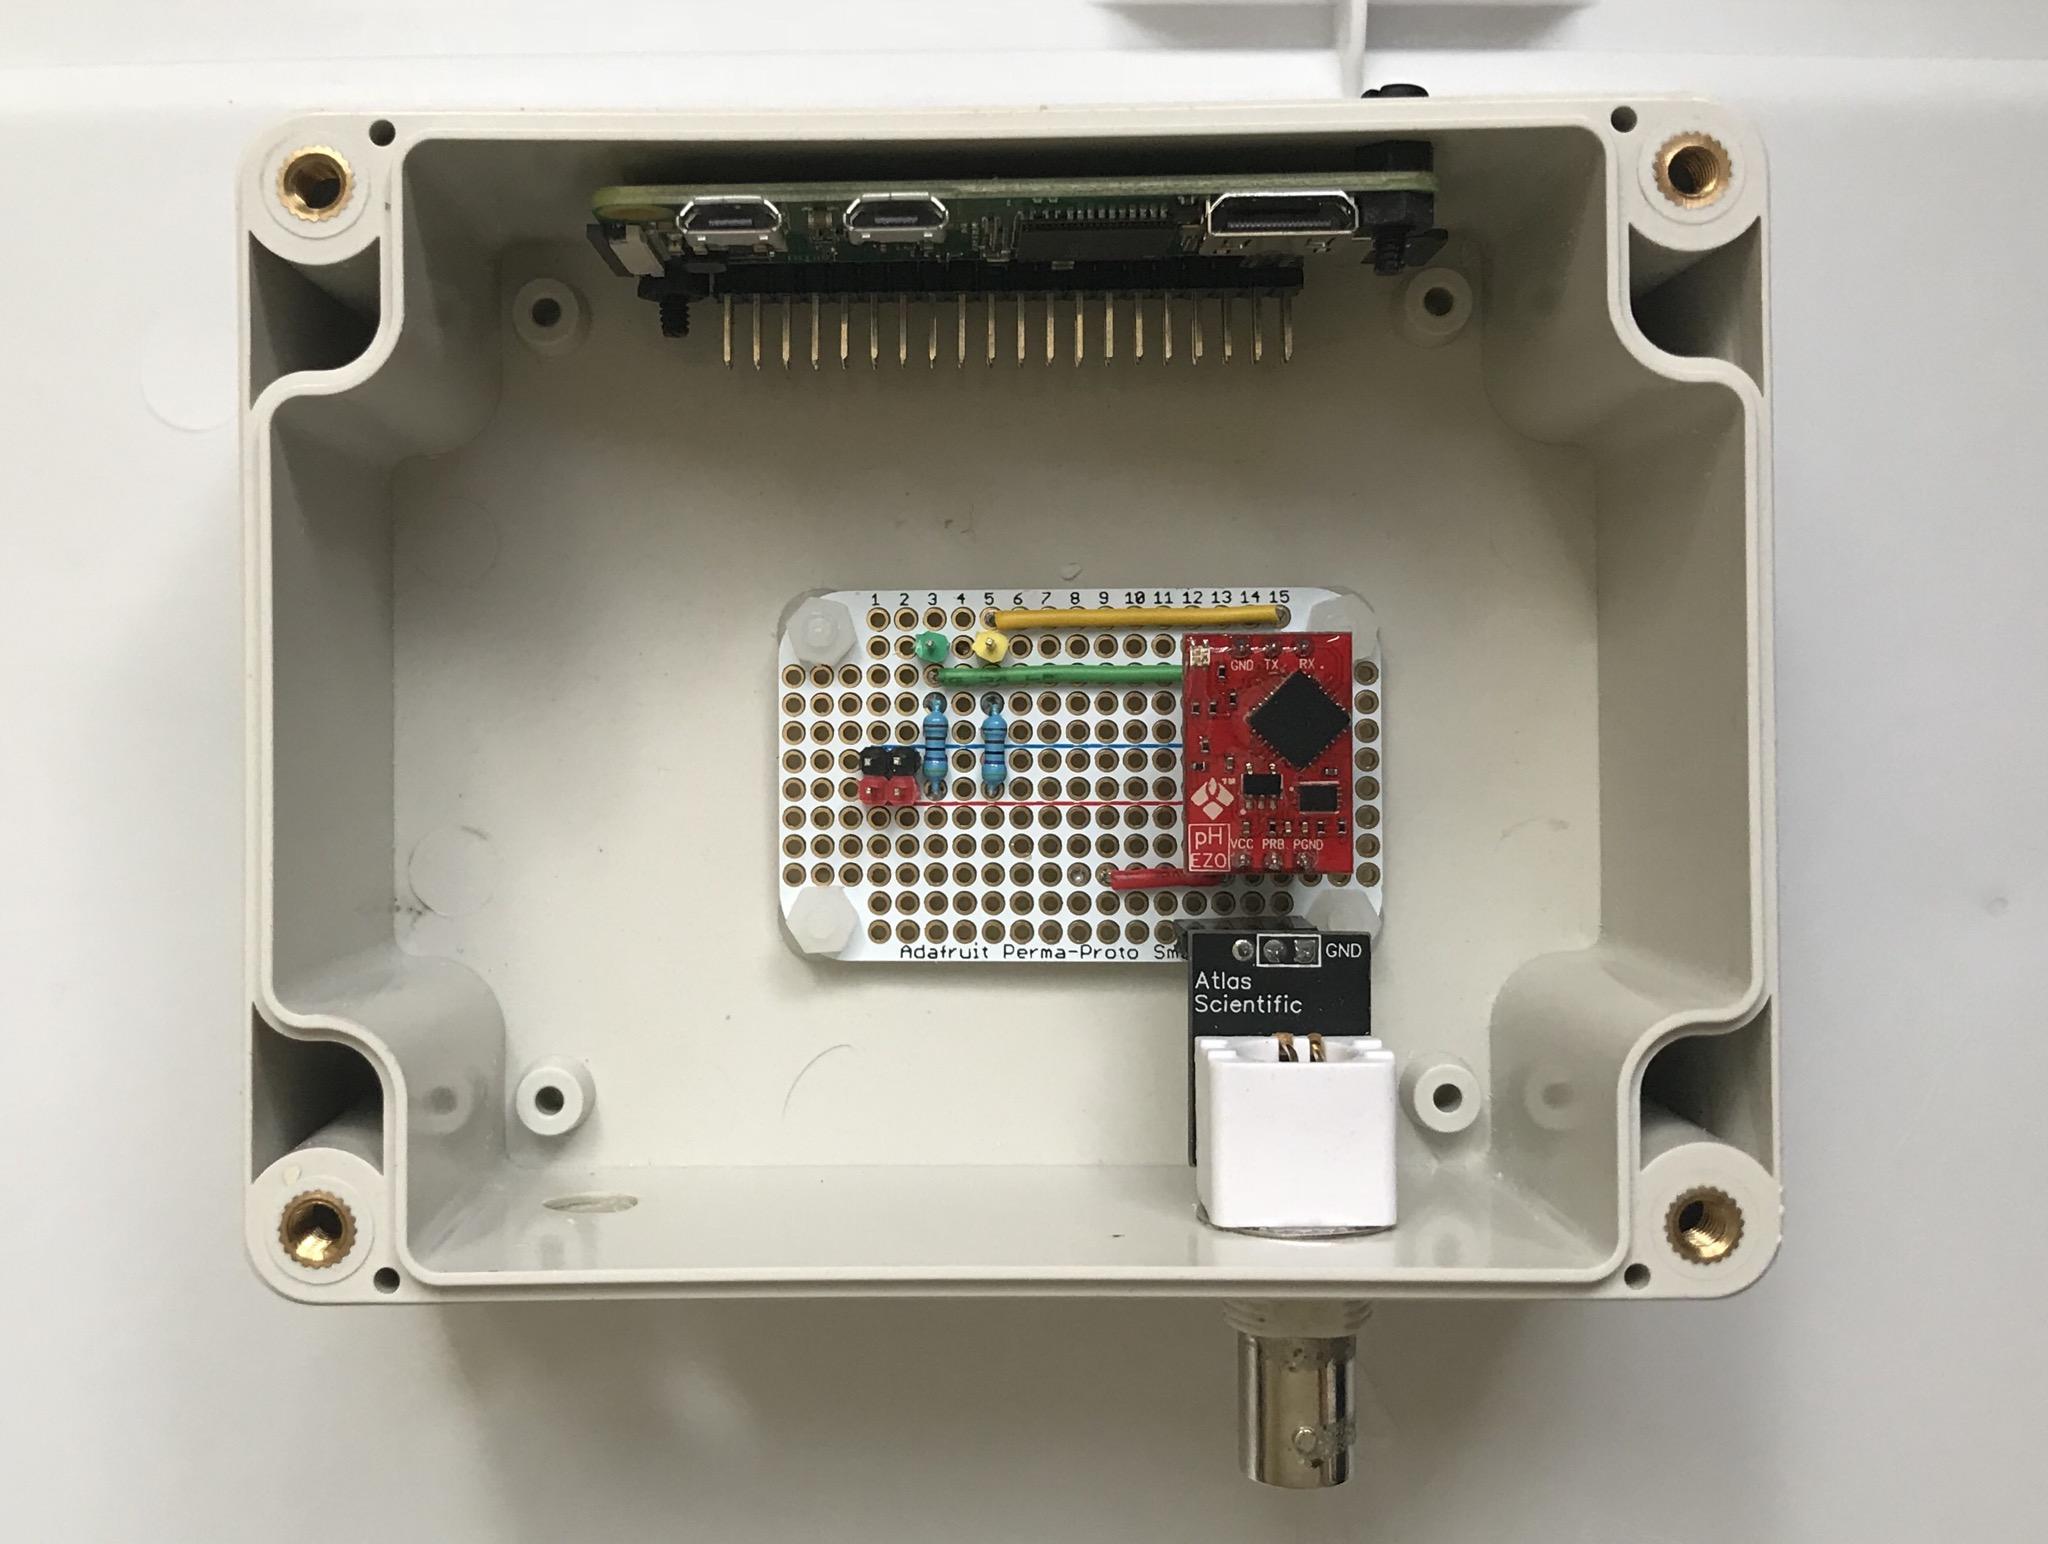 sensors_28DA1B18-EEDD-499A-9D60-36F4FA937A6E.jpeg